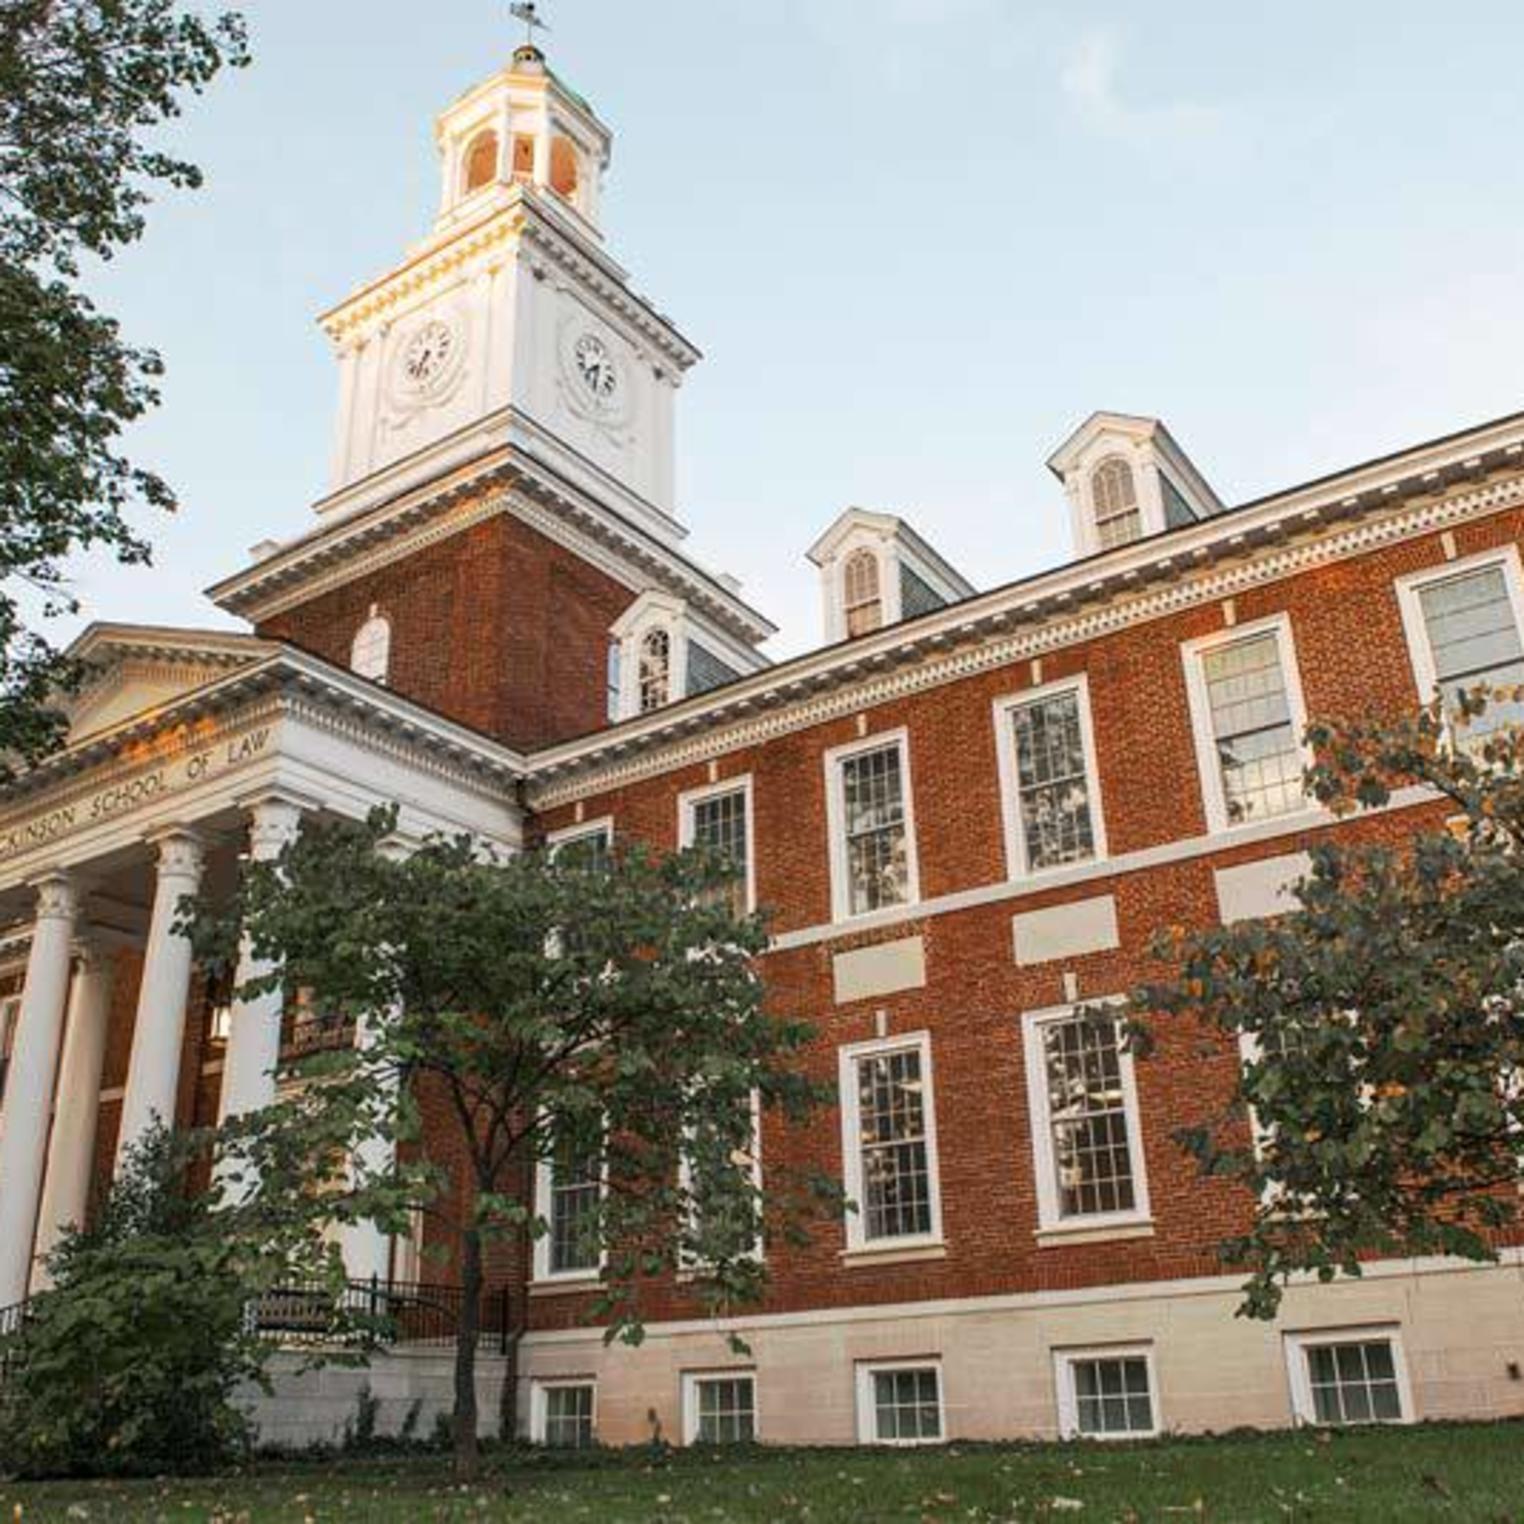 Penn State Dickinson School of Law